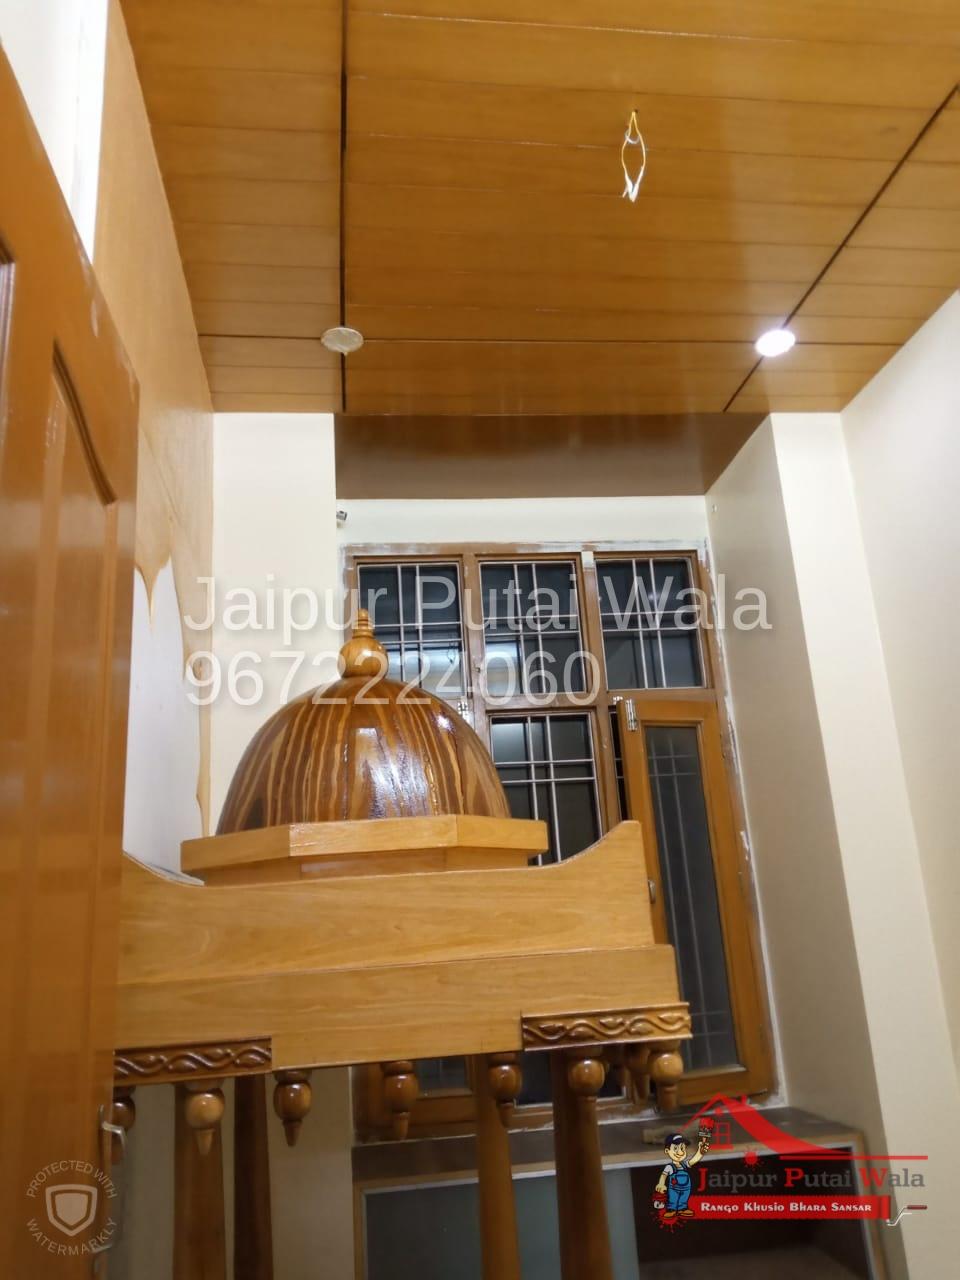 melamine-glossy-veneer-jaipur-wood-polish-4.jpeg